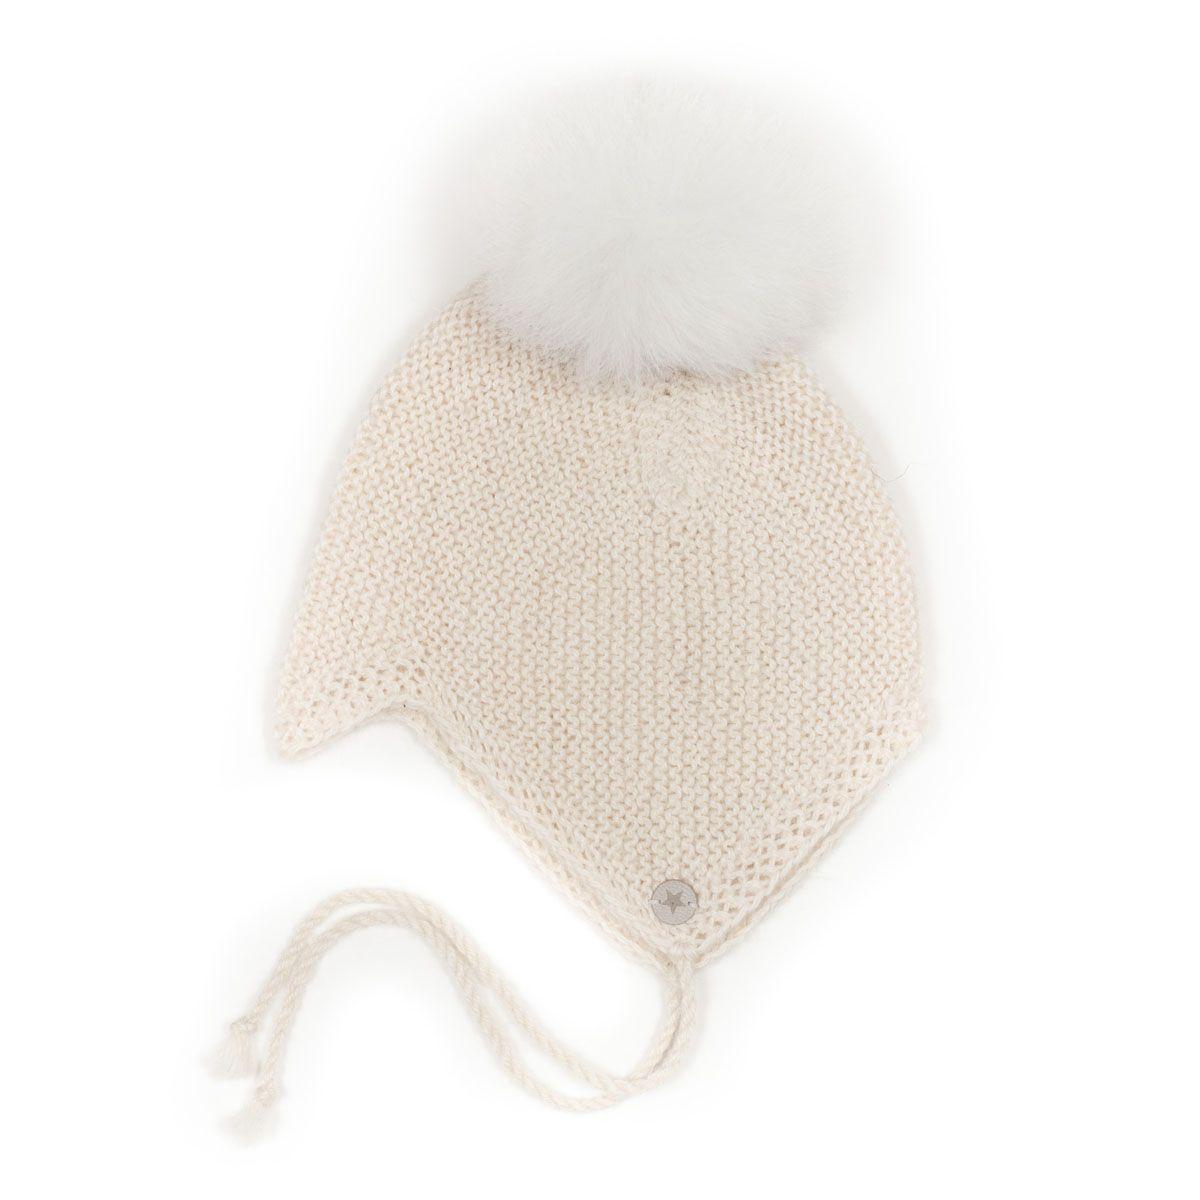 Huttelihut BABYHUT Alpaca Wool Off White/White